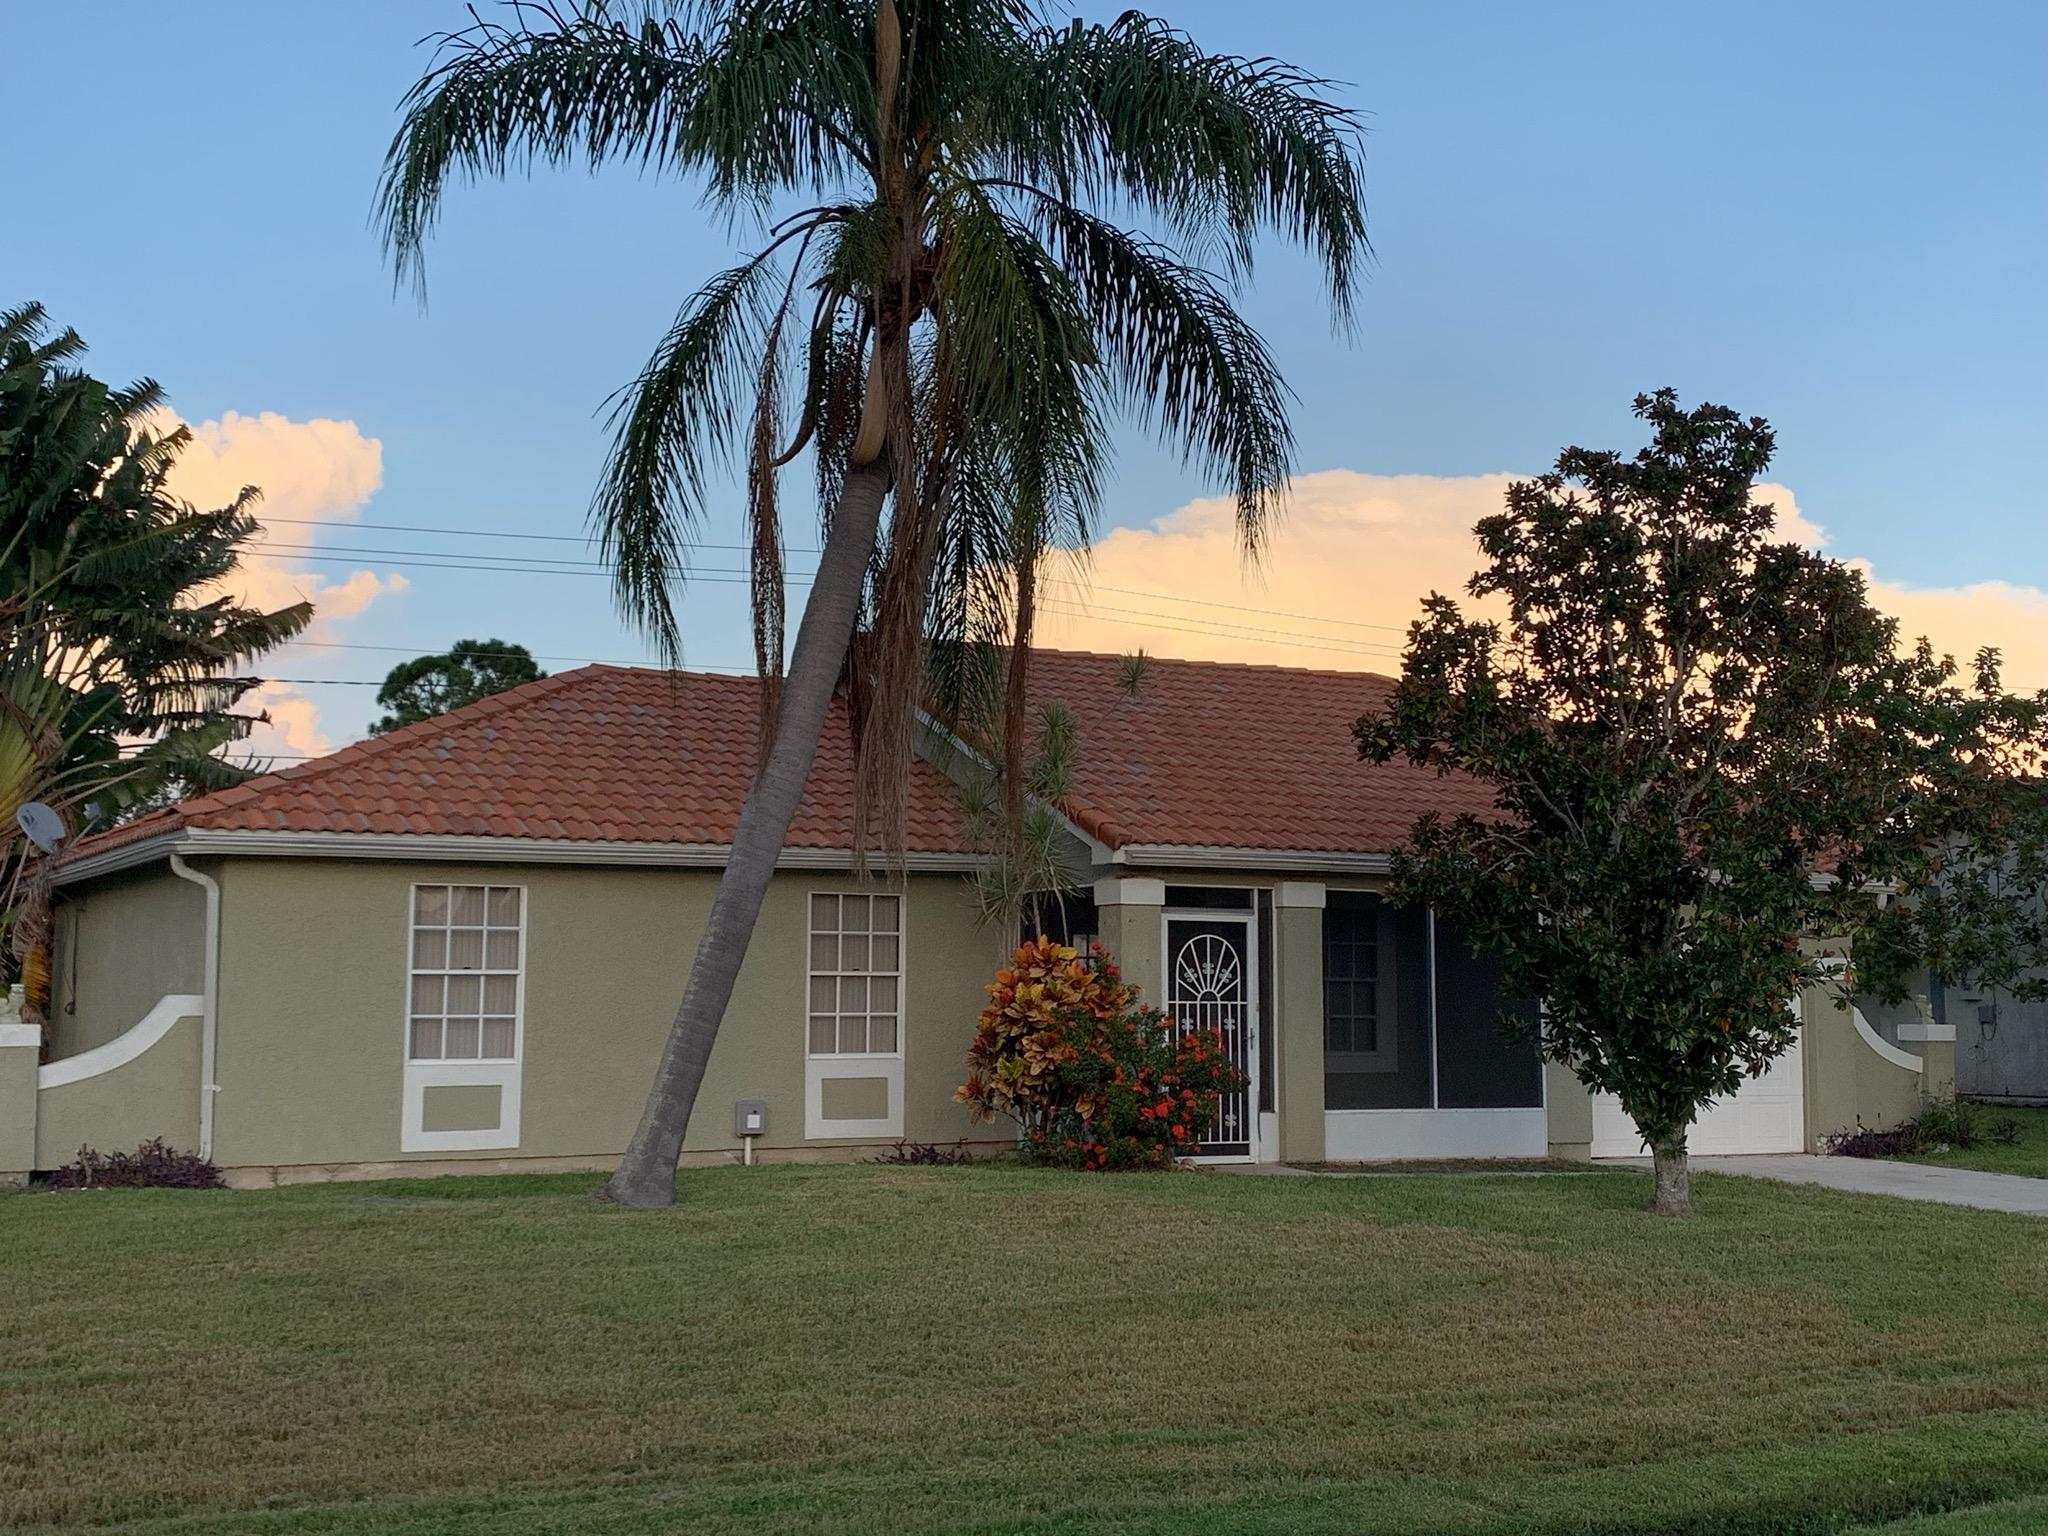 1501 Se Appamattox Terrace, Port Saint Lucie, FL 34952